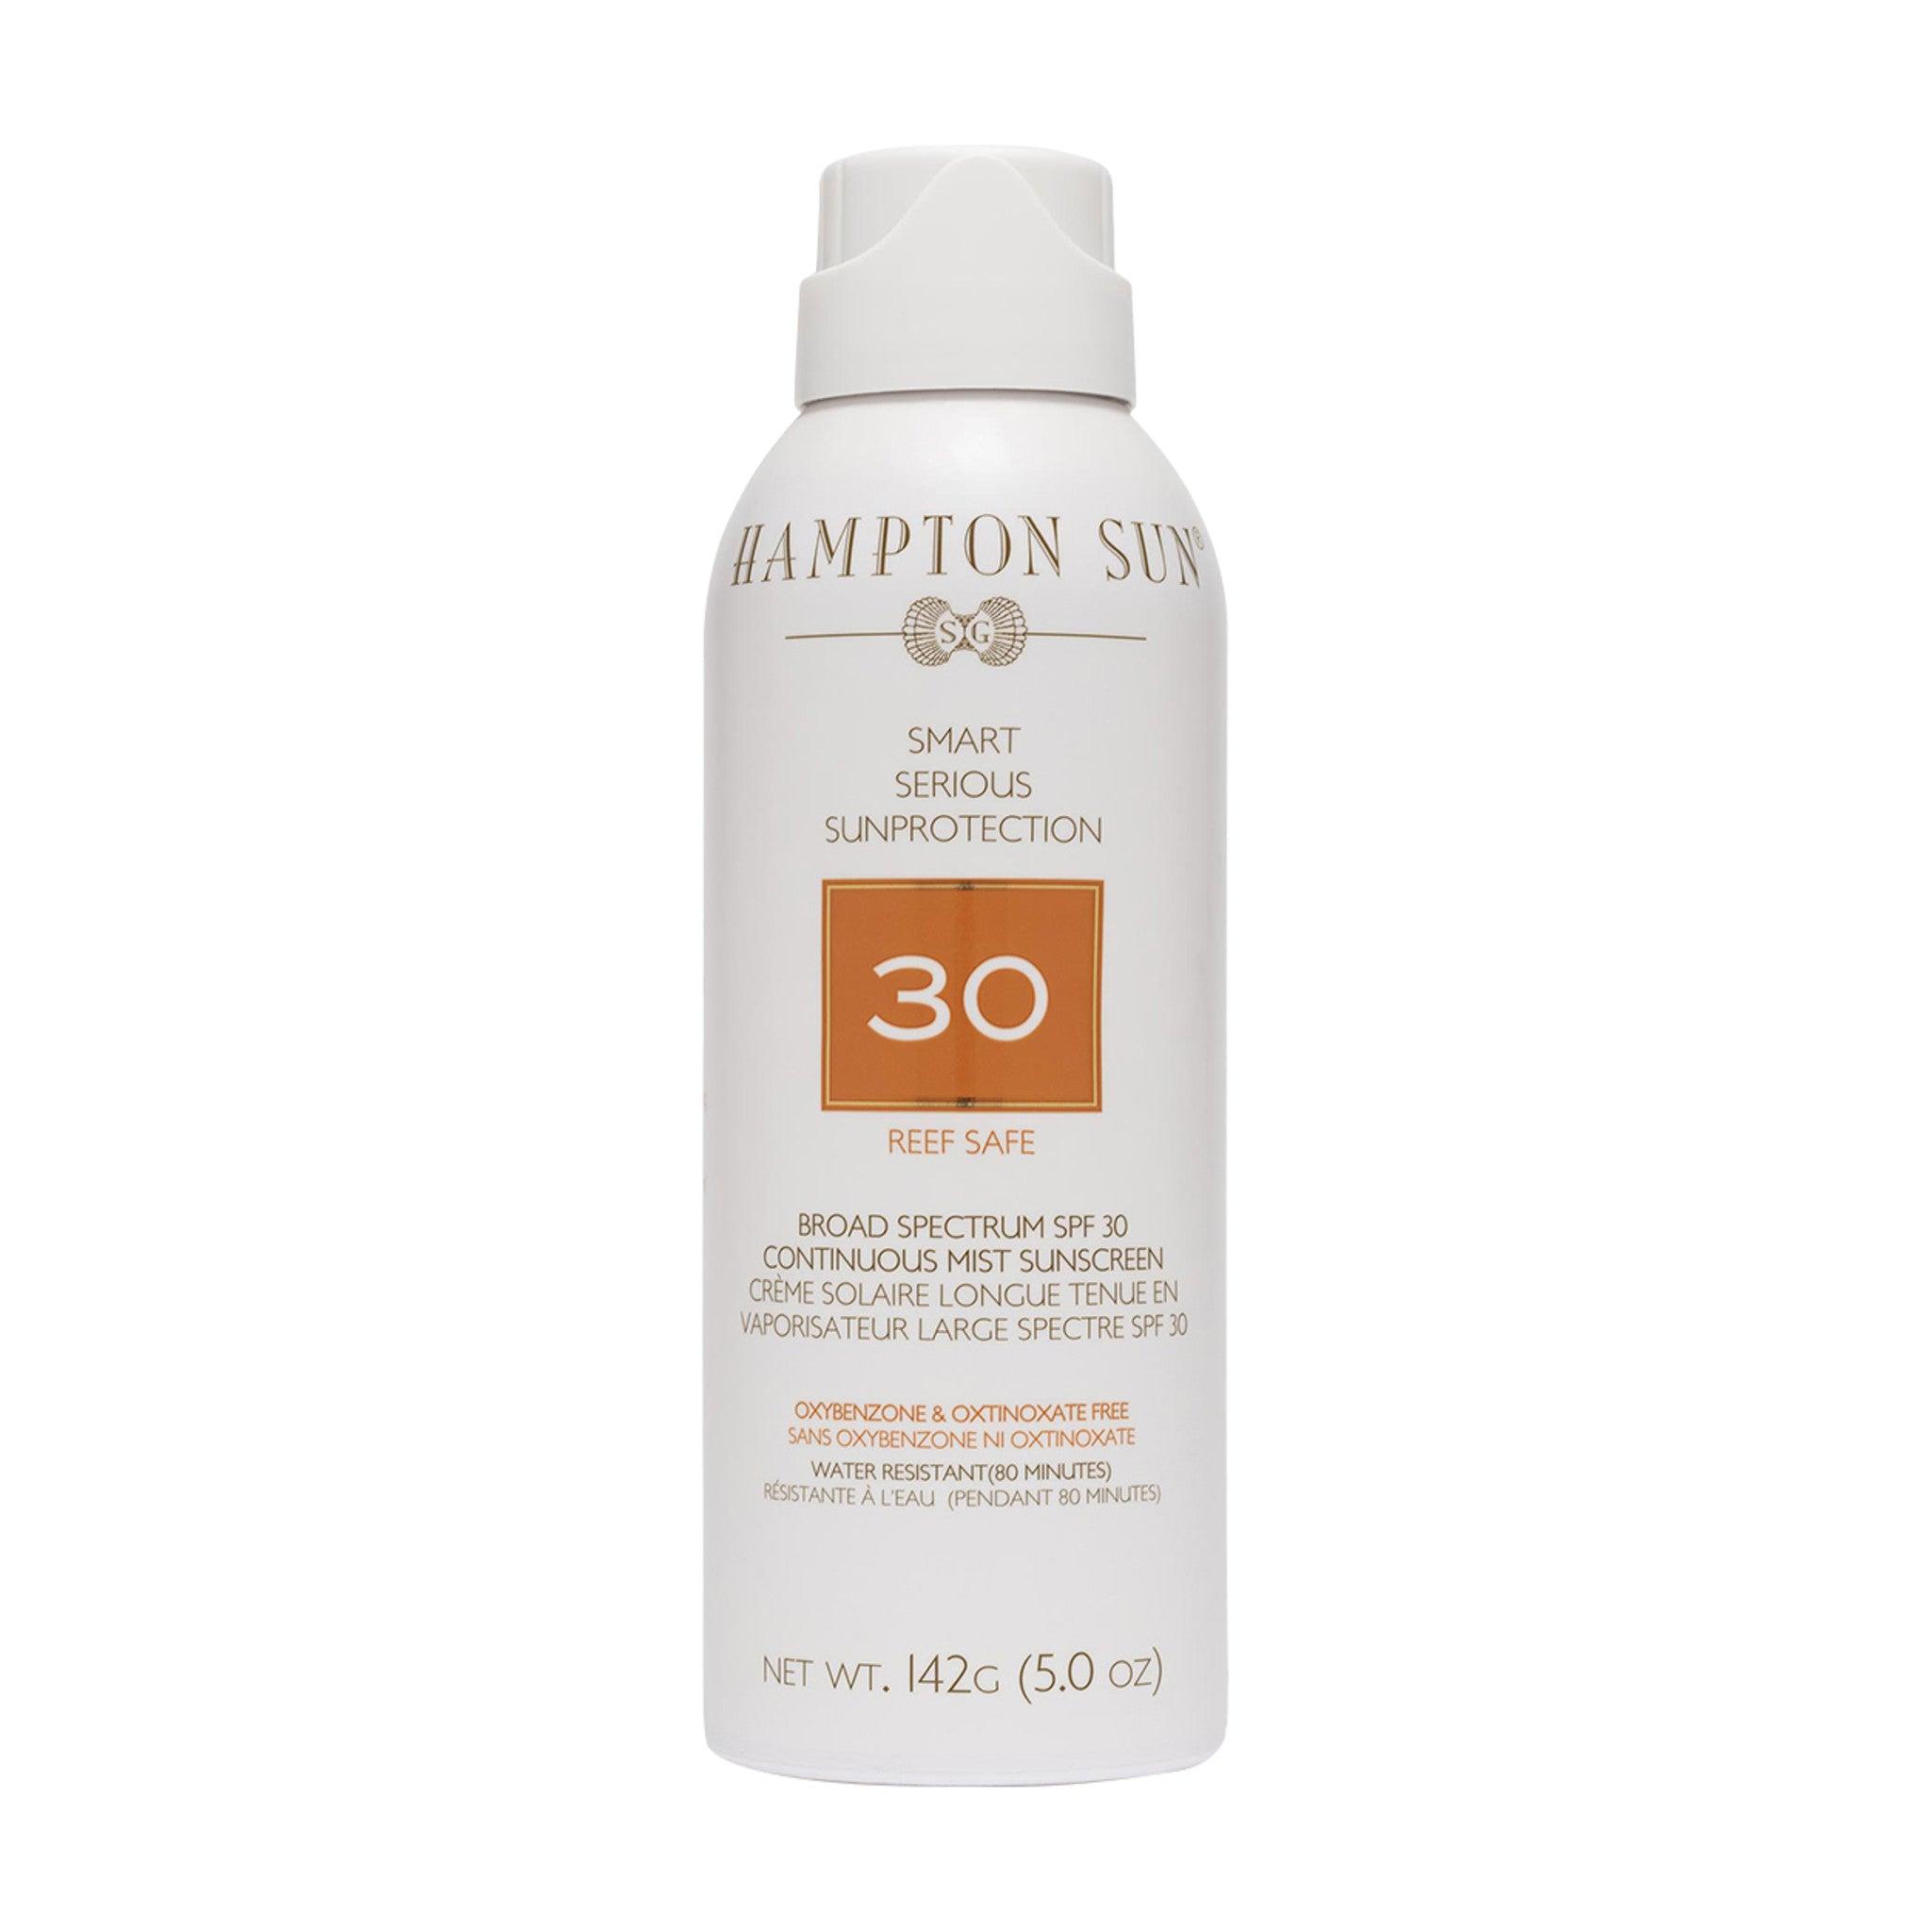 Sun SPF 30 Continuous Mist Sunscreen - Size: 5 oz